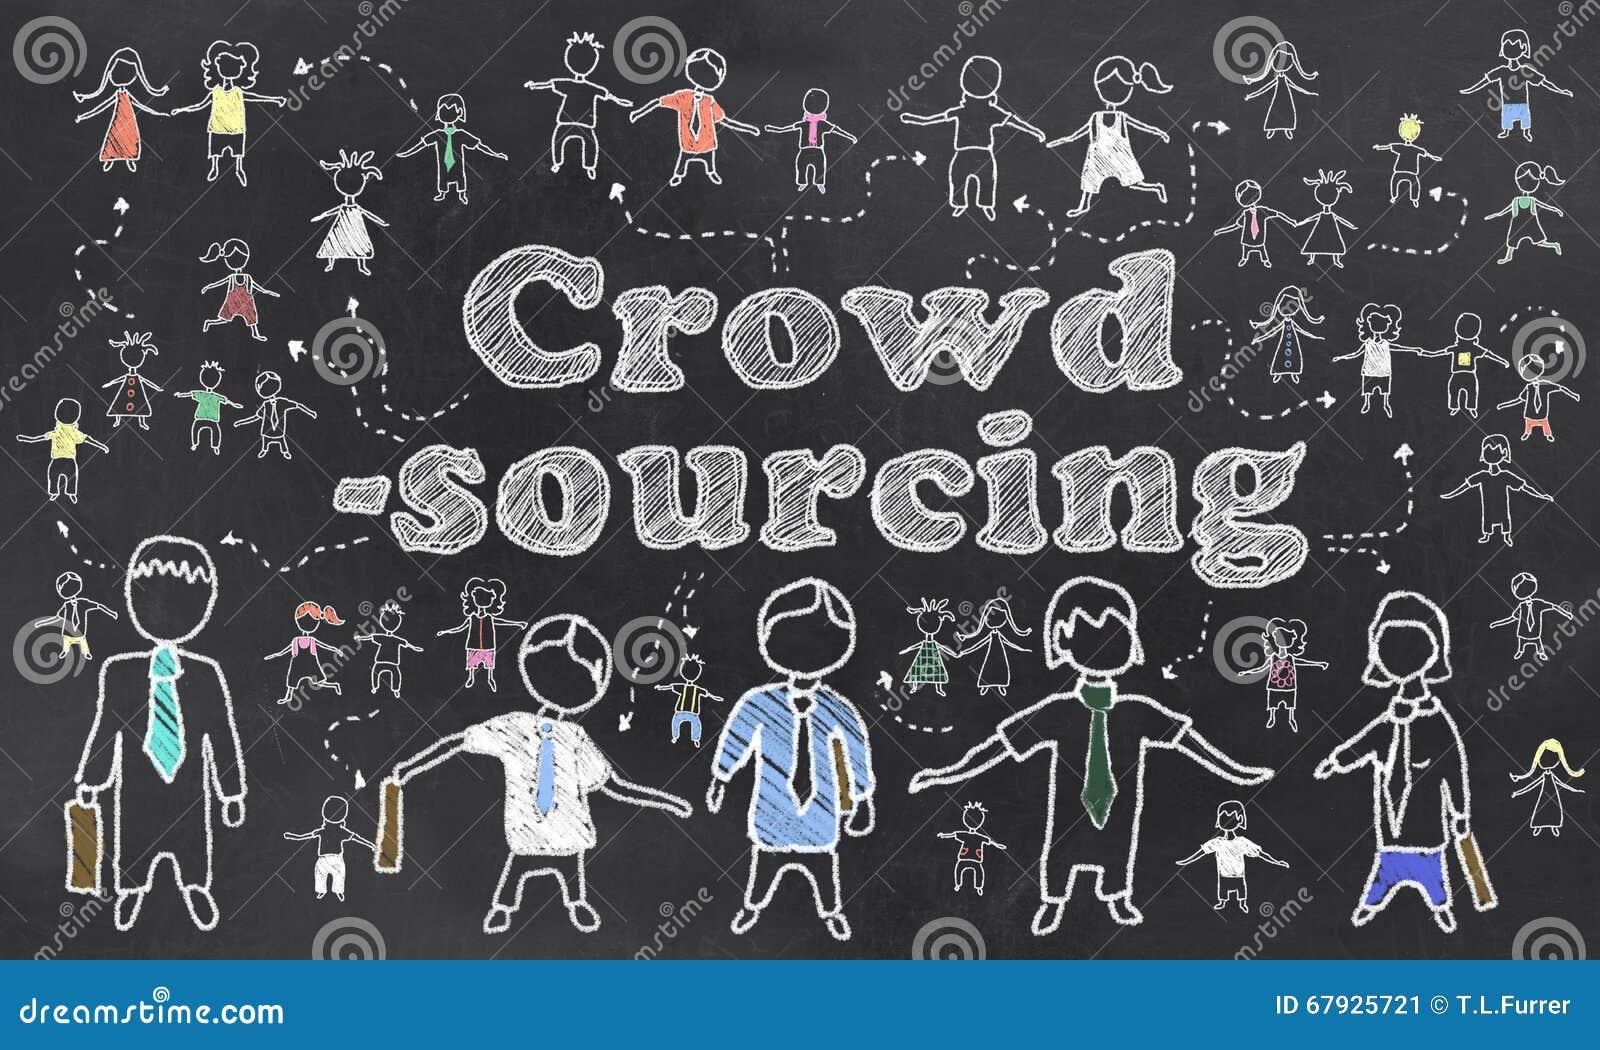 Crowdsourcing在黑板说明了